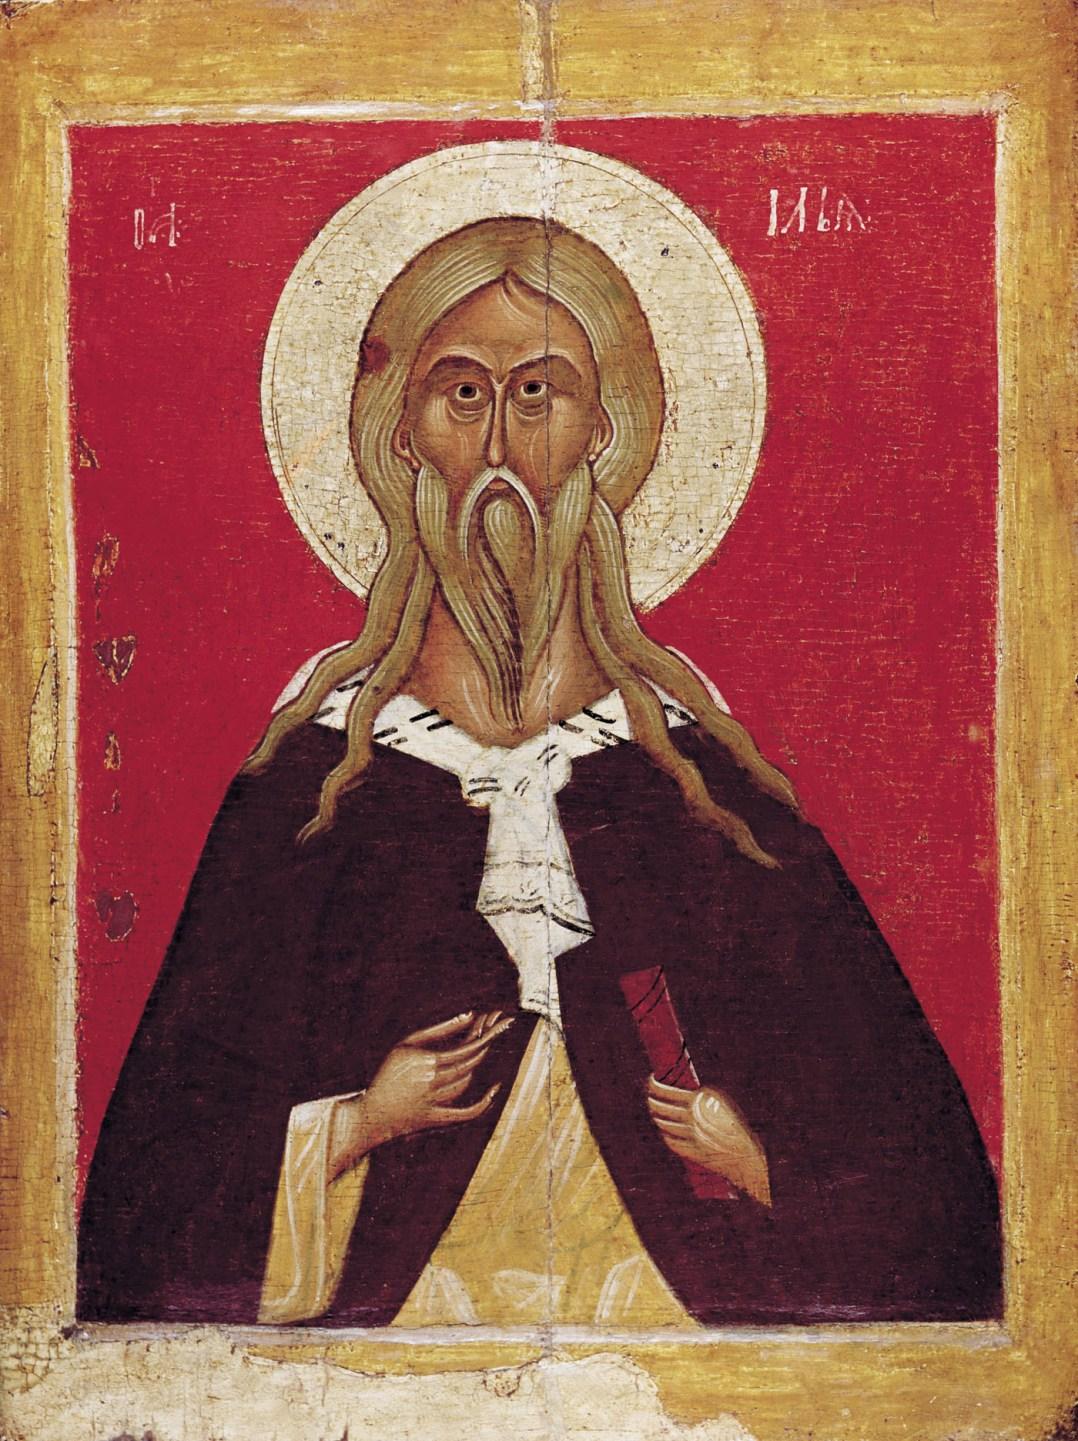 Пророк Илия. Икона, конец XIV - начало XV века. Новгород